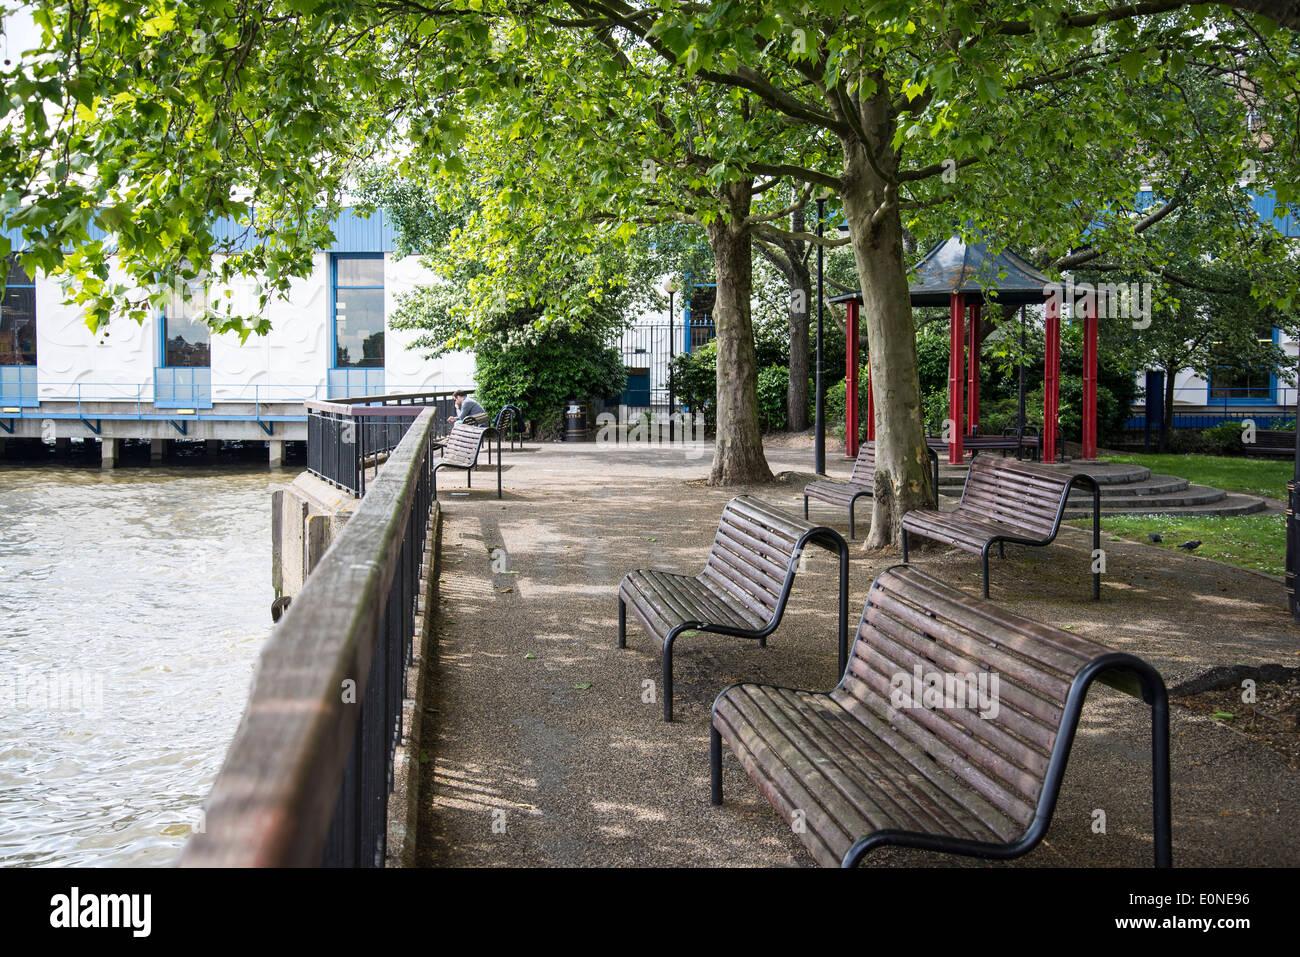 Waterside Gardens, Wapping High Street, Tower Hamlets, London, UK - Stock Image